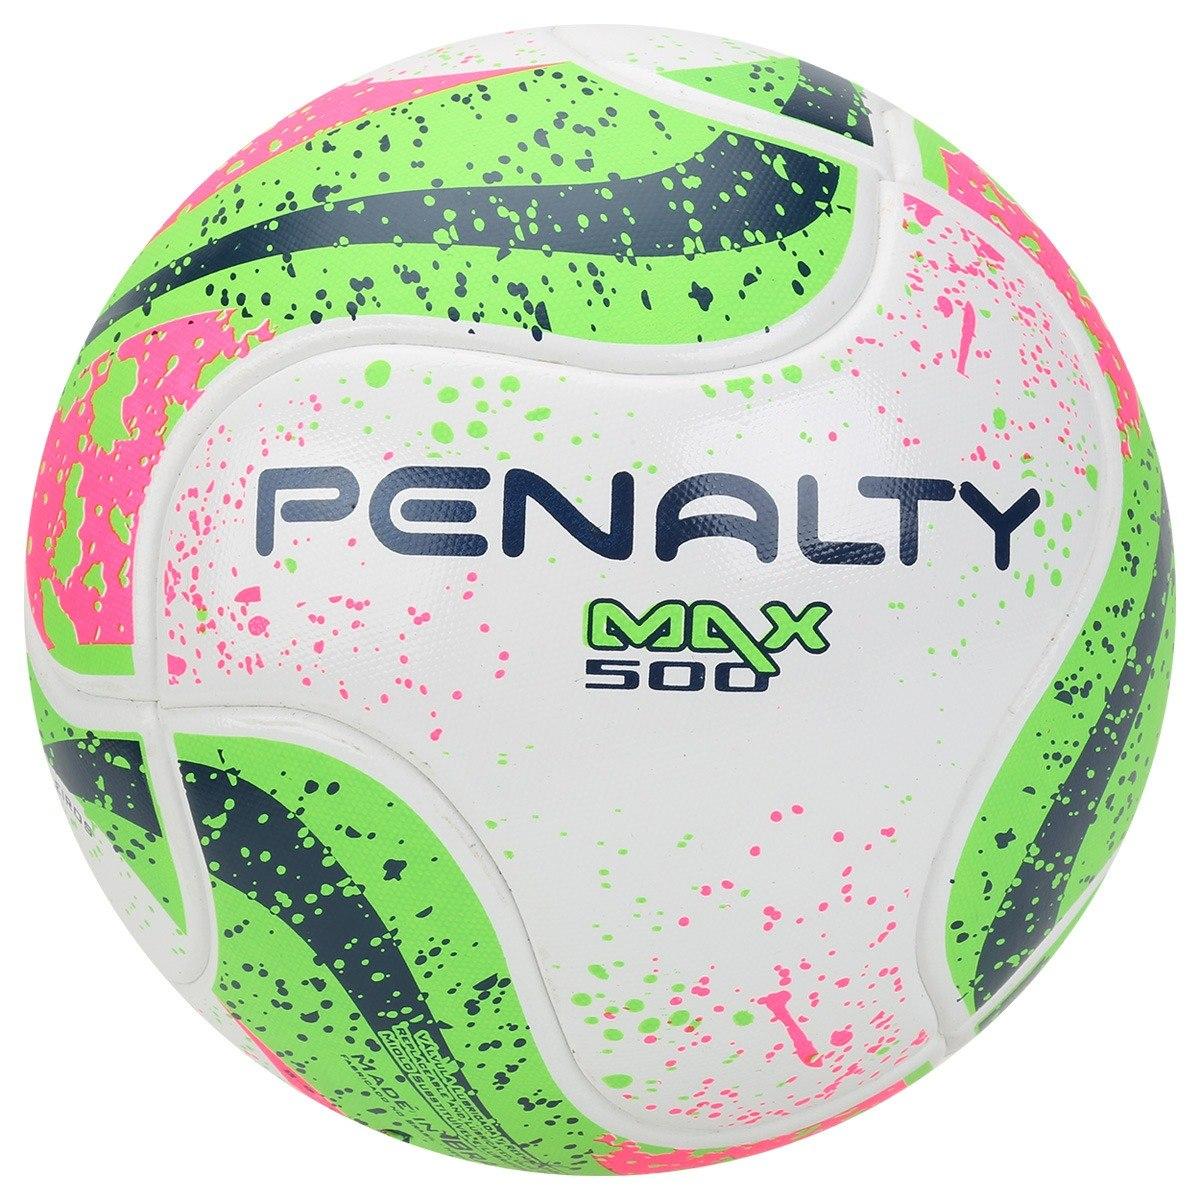 081967f2d6 bola futsal penalty max 500 termotec 7 sem costura - 541442. Carregando zoom .